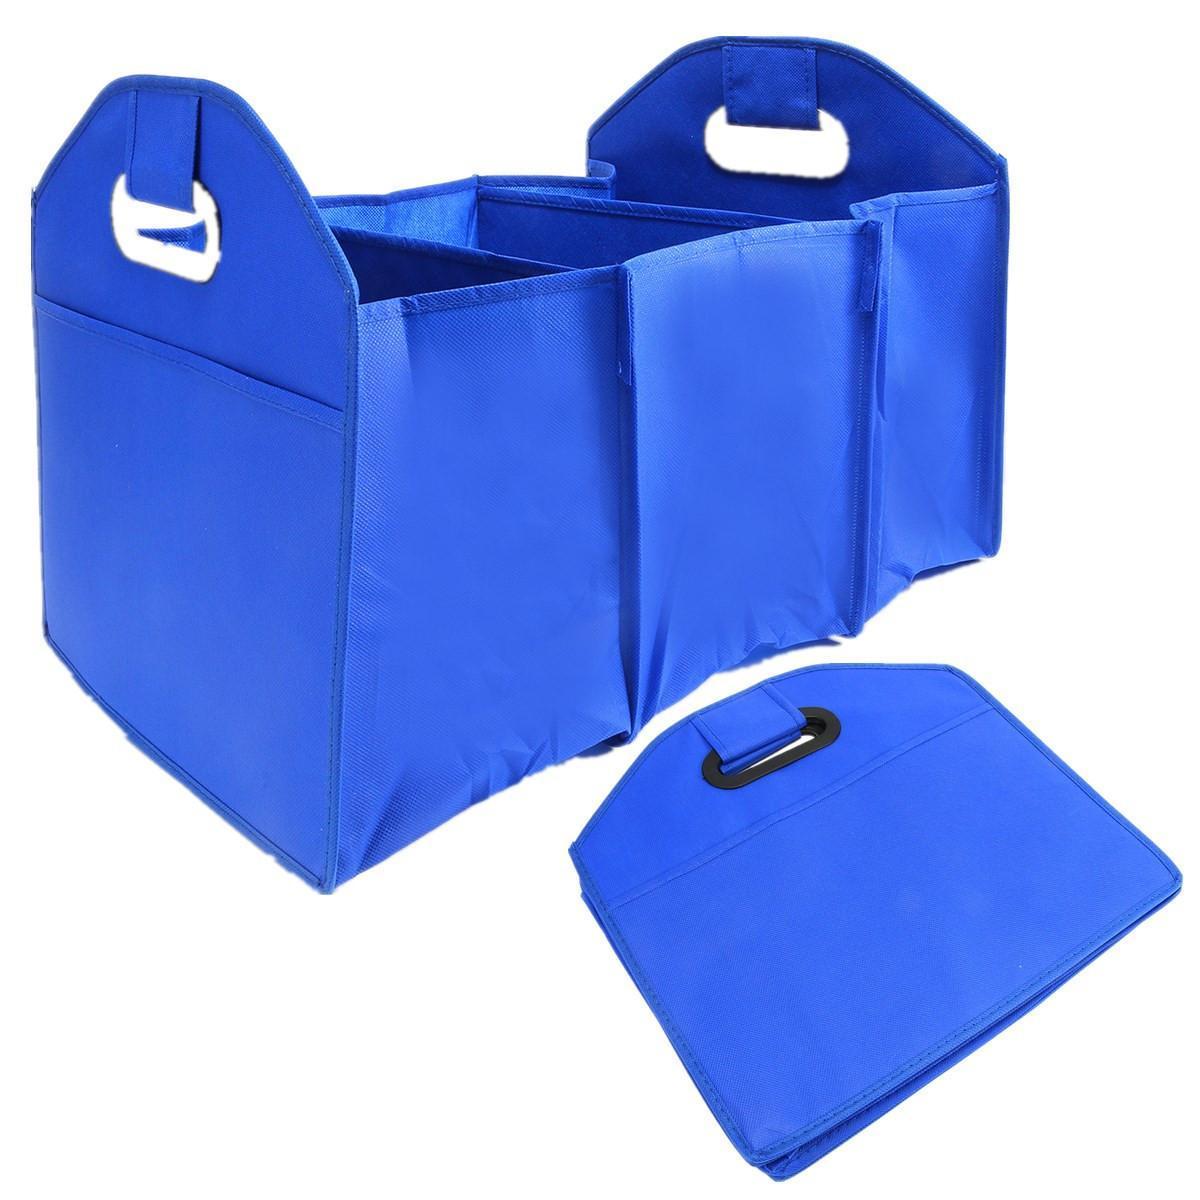 f12de33c2bc9 Car Seat Back Rear Travel Interior Bag Hanger Accessory Storage Organizer  Holder